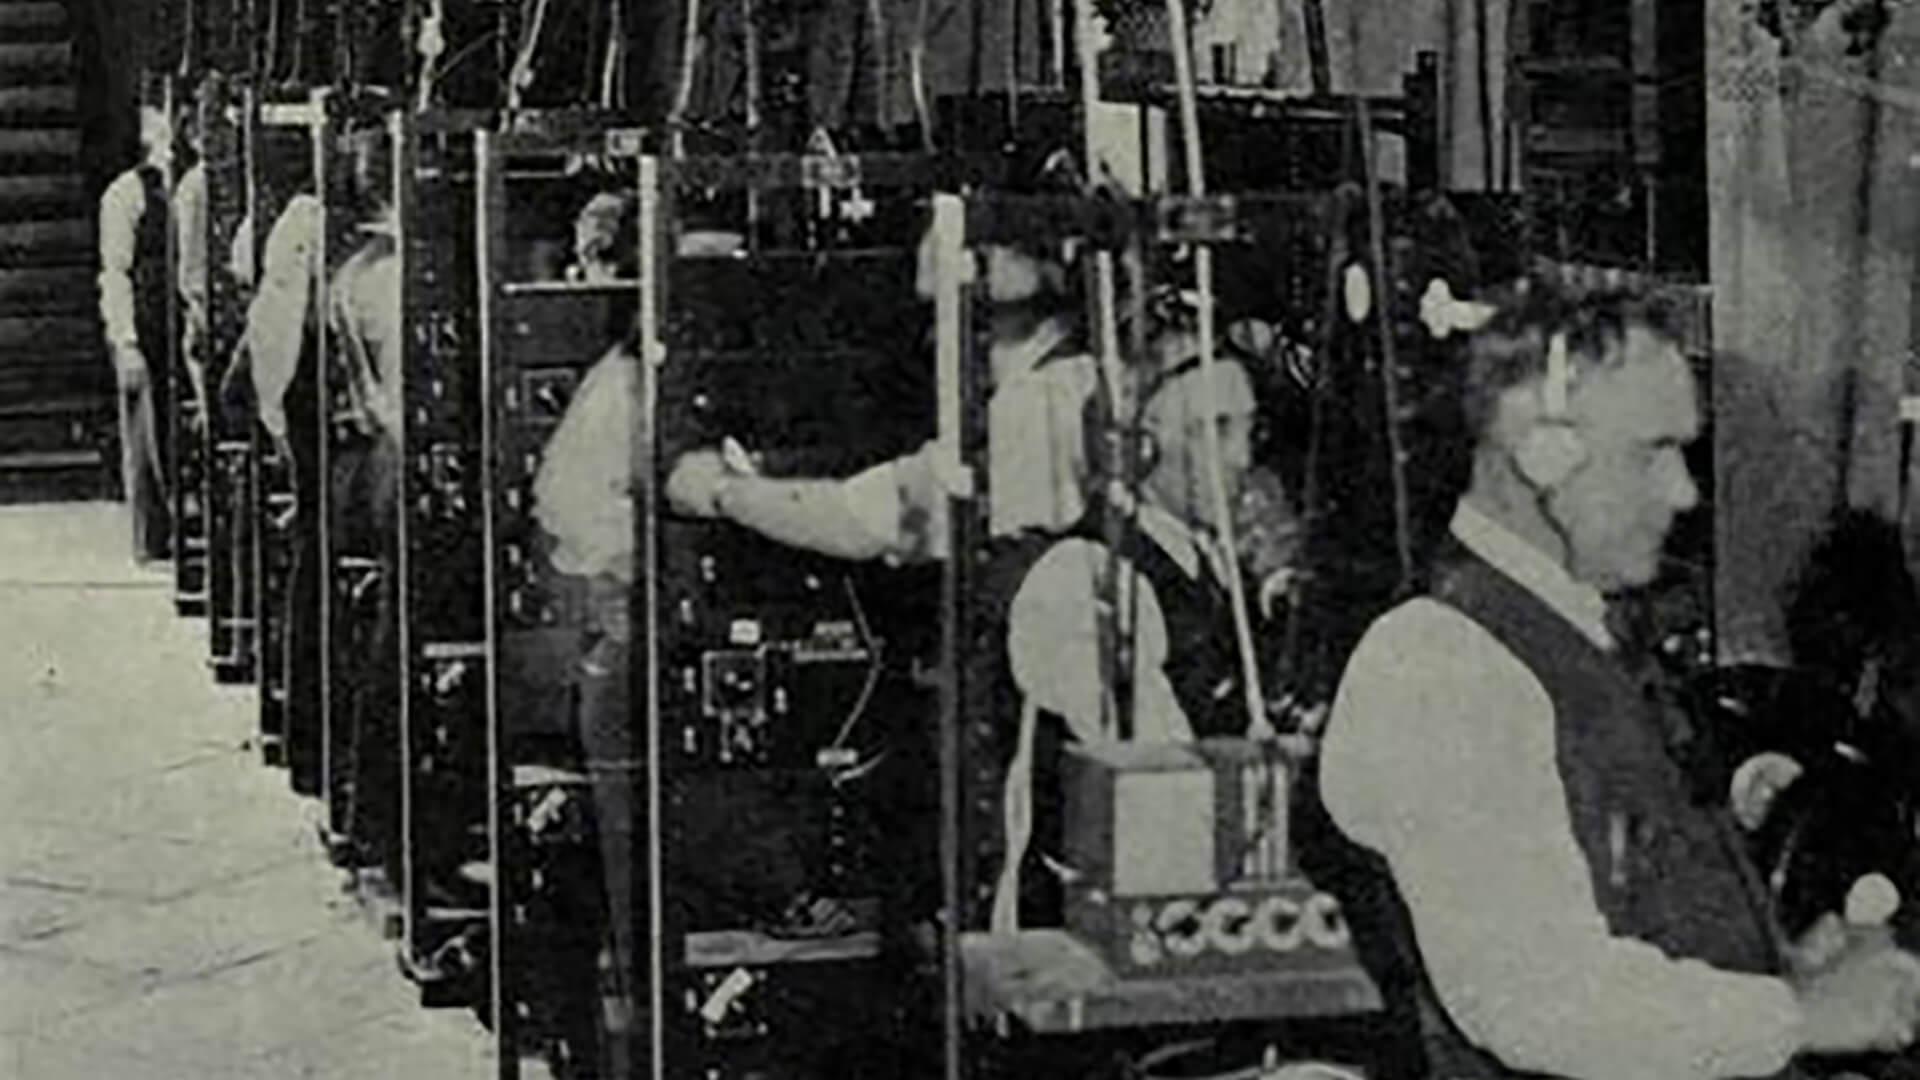 Image of Fantasound operators.